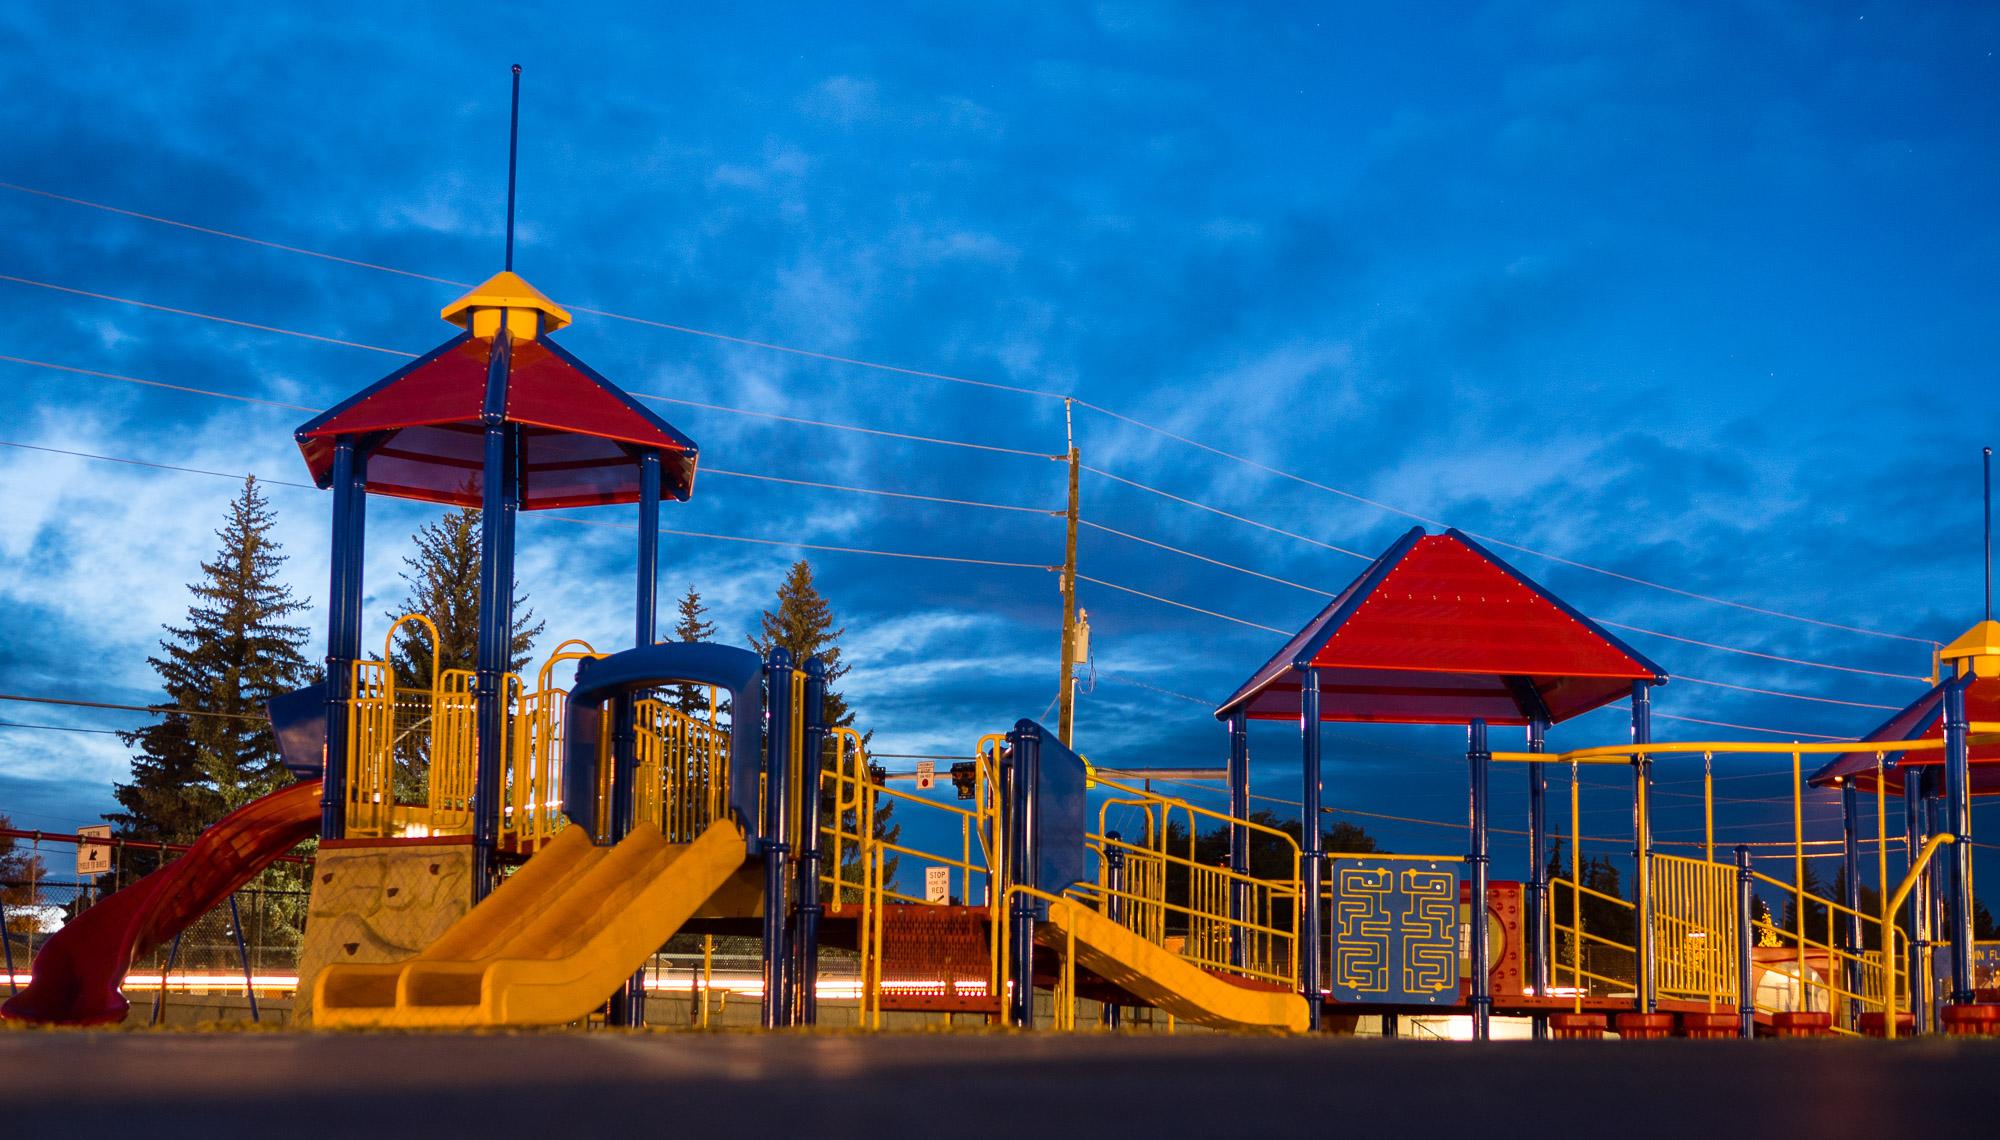 Davis Elementary playground